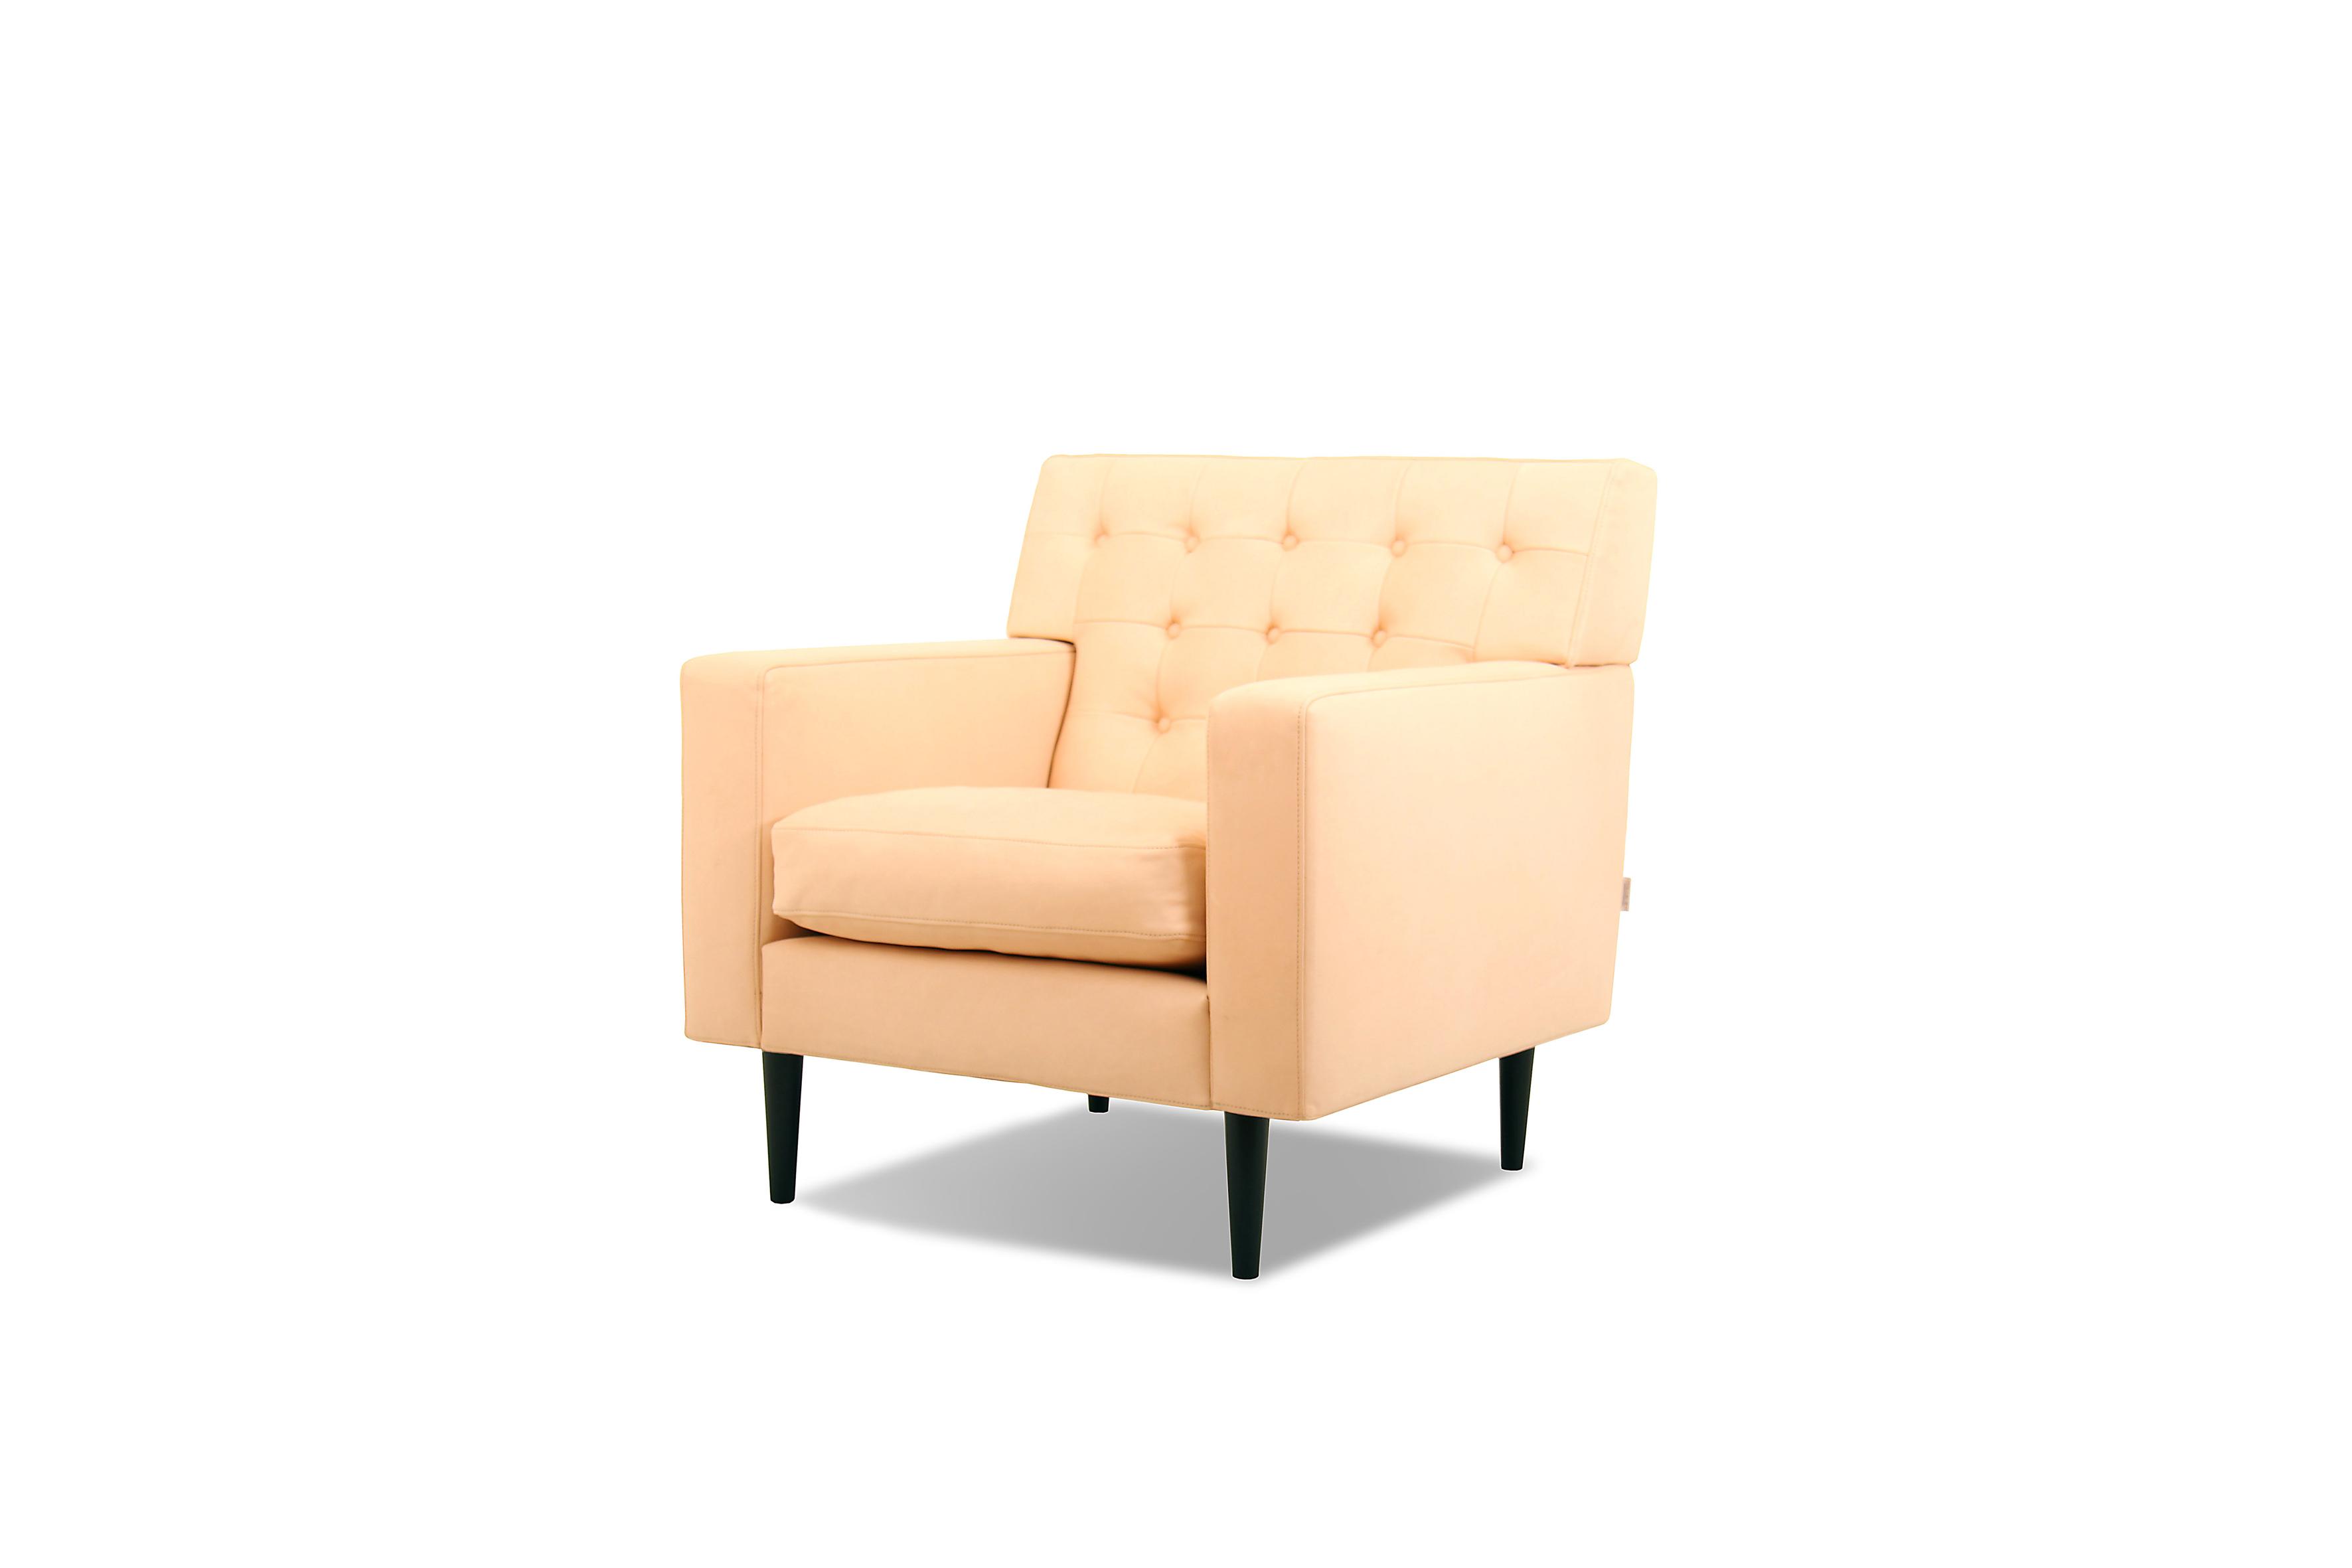 Ihreborn Public Environment Furniture Scandinavian Design